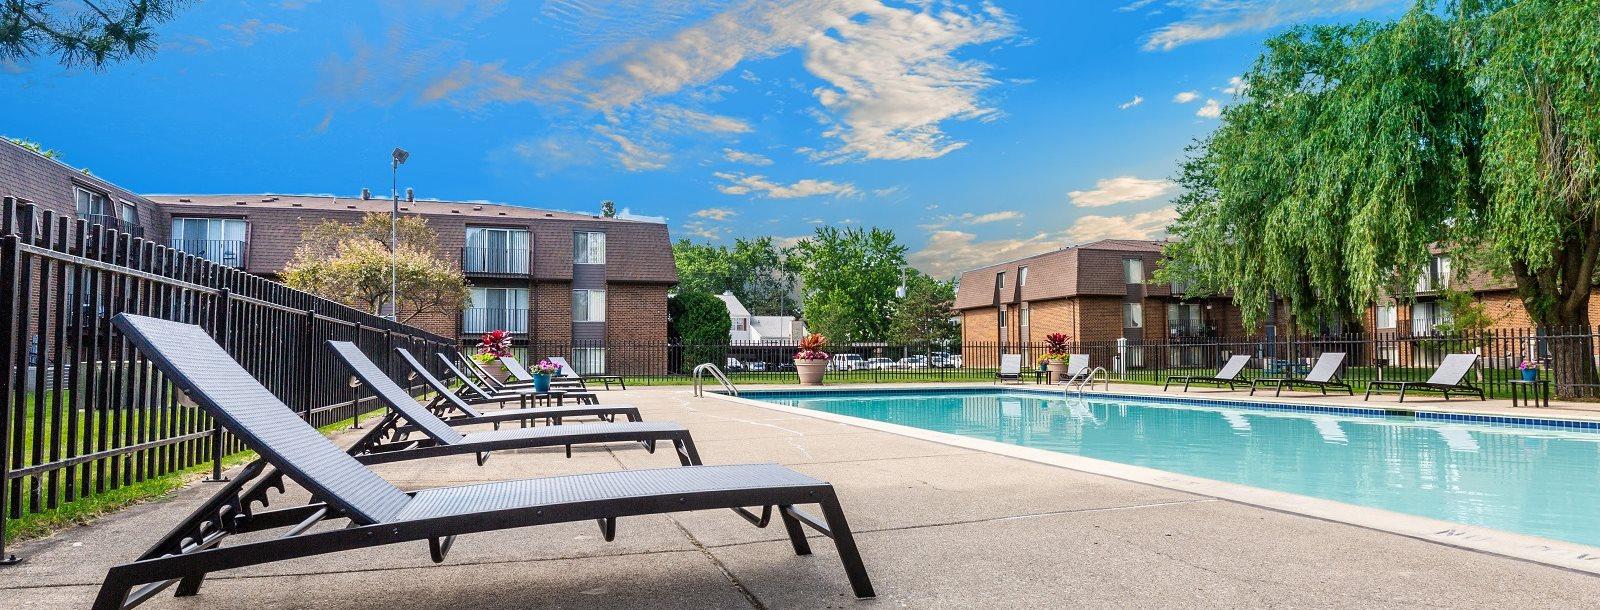 Swimming Pool at Drawbridge Apartments East, Near Clinton Township, Michigan